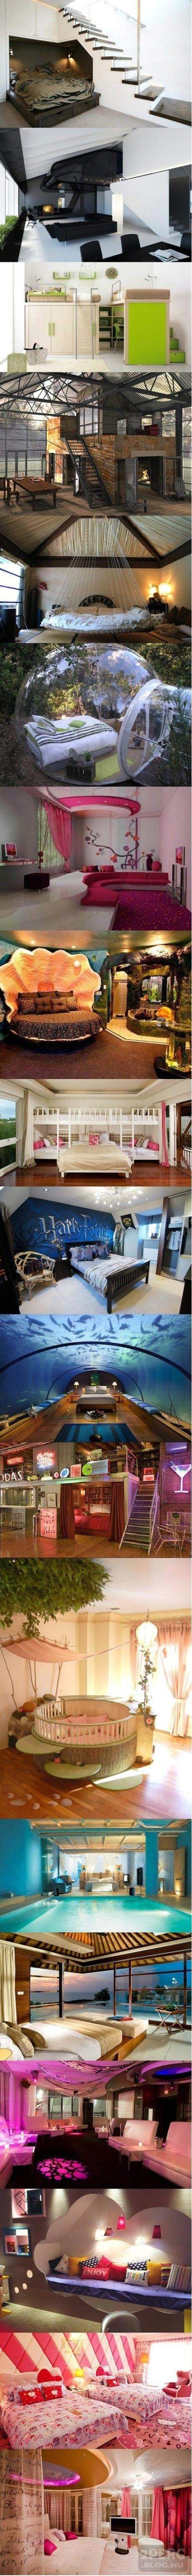 ummm harry potter room... whatt?! def making this happen for my kids hehe